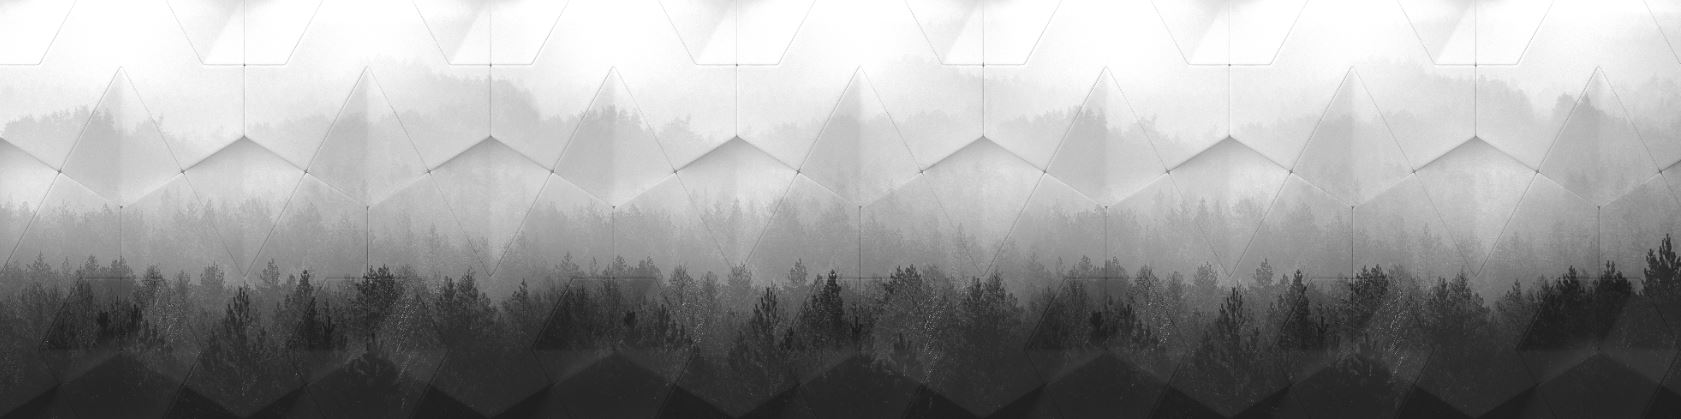 ARCH 2019-2a Geometric Pines BW